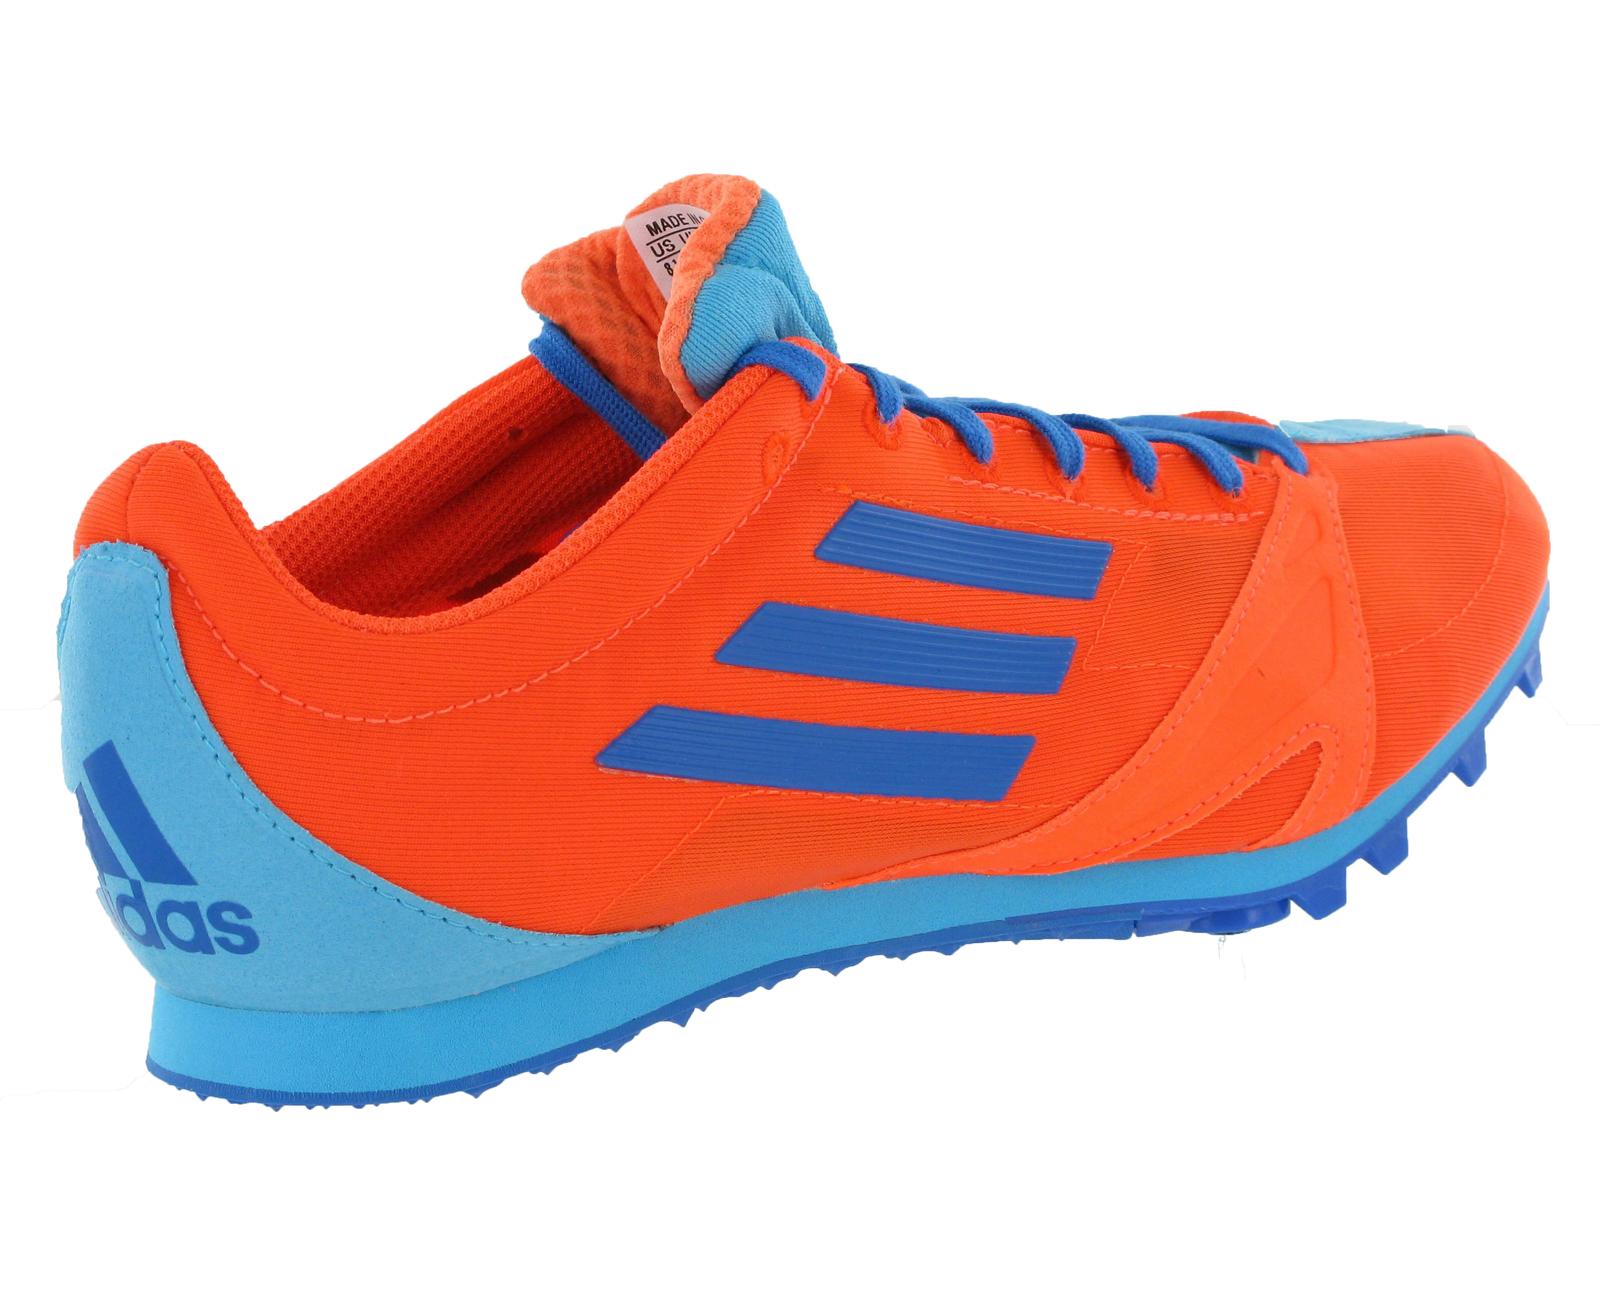 Adidas Size 5 Boys Shoes K K Sound